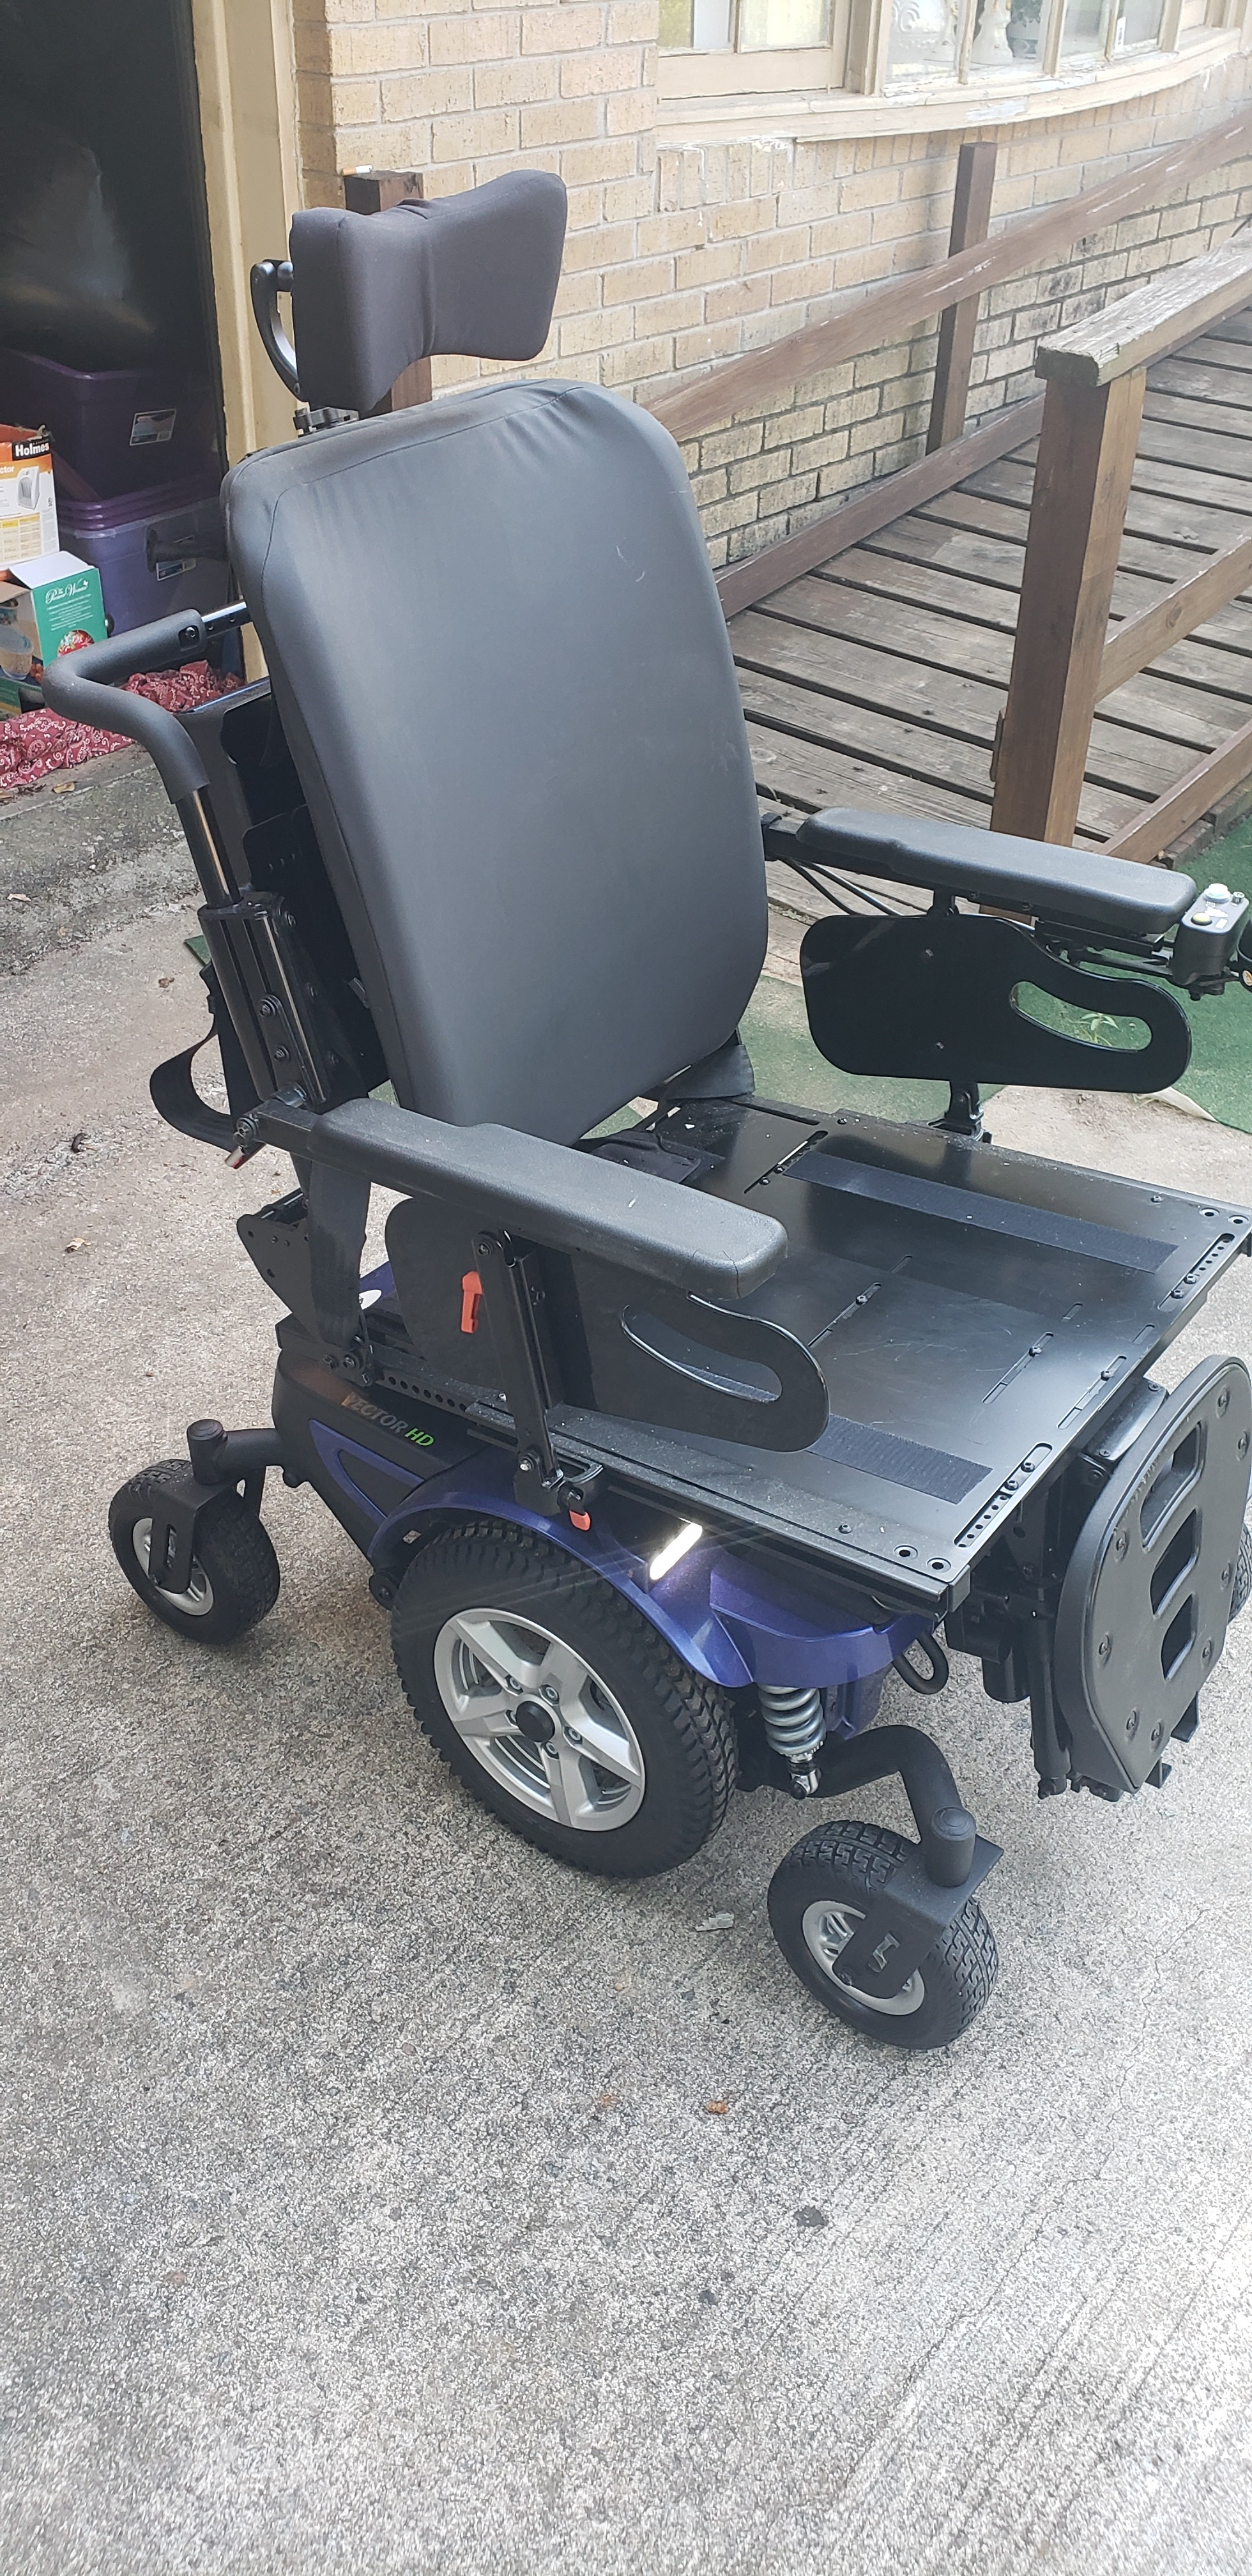 Photo 2 of Power wheelchair